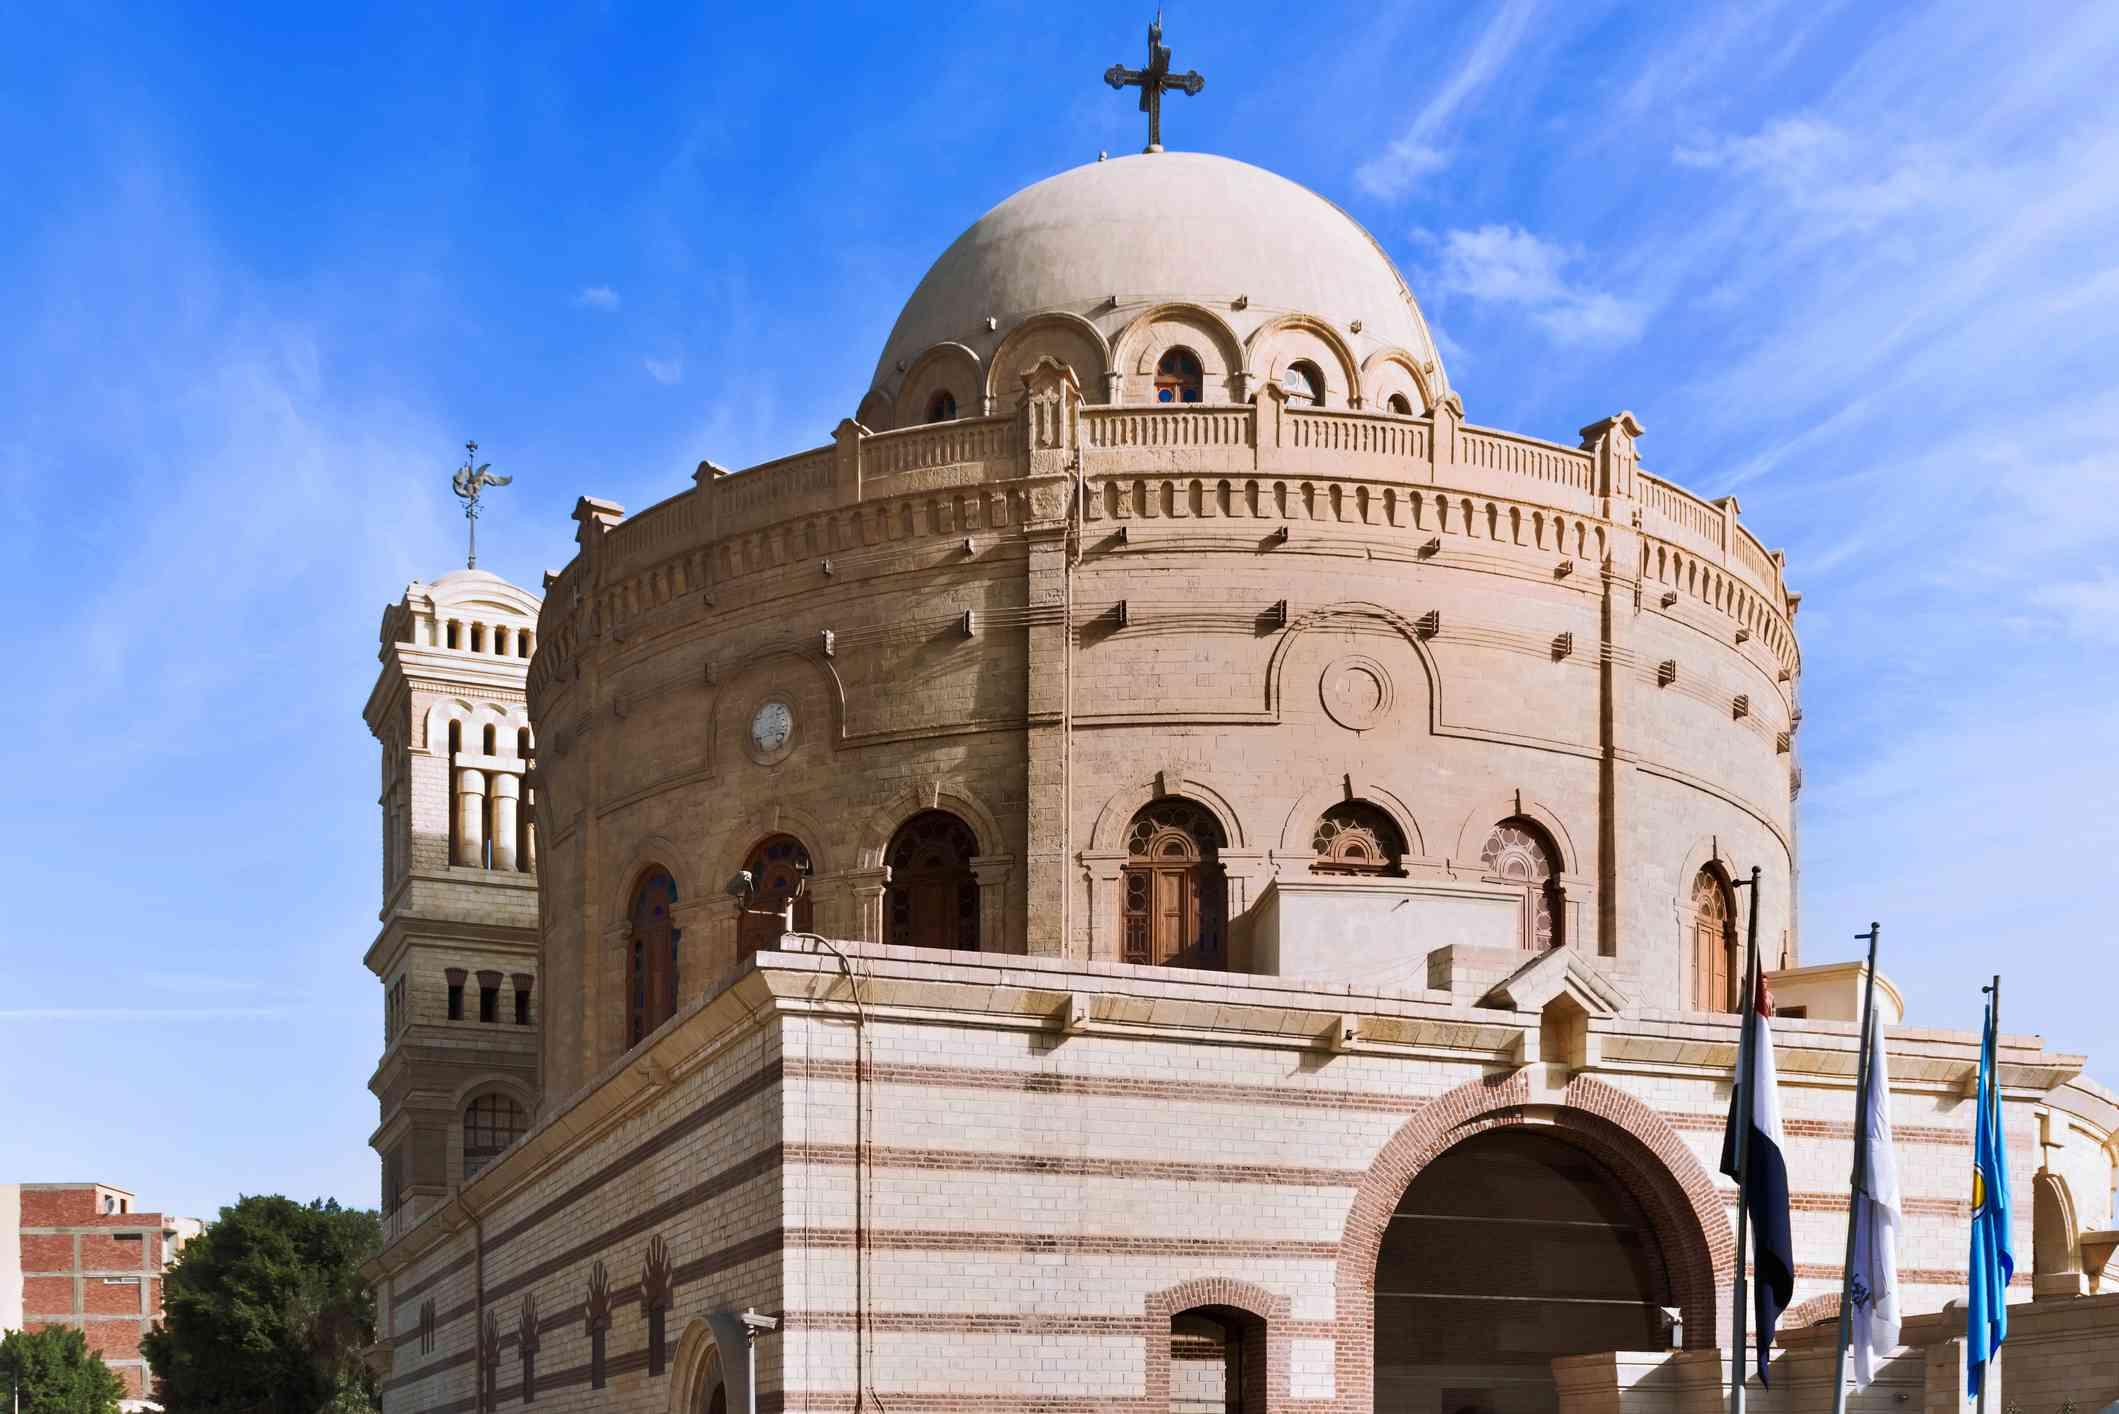 Hanging Coptic Church (El Muallaqa)in old Cairo, Egypt